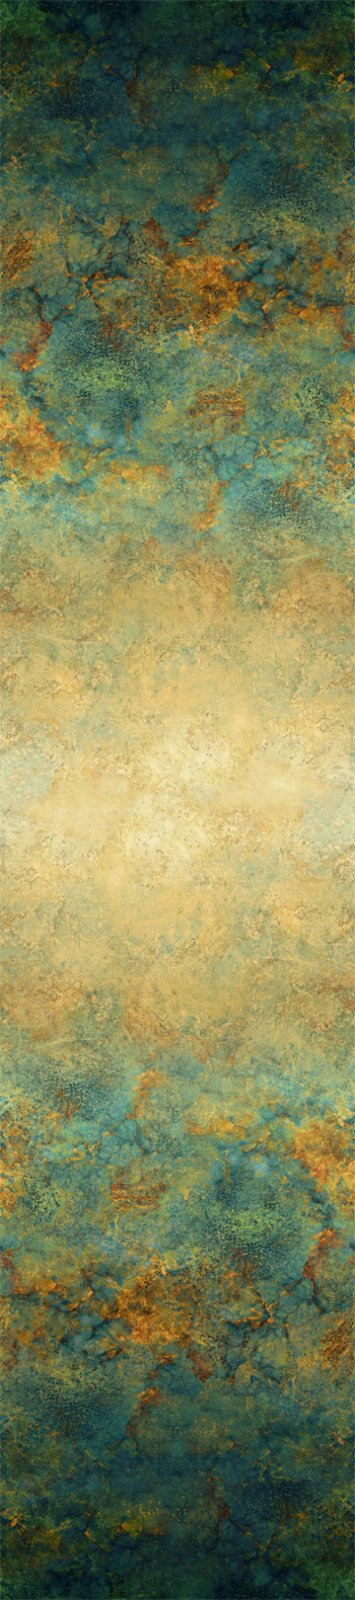 Northcott Stonehenge Solstice B39433-69 108 Backing 100% Cotton